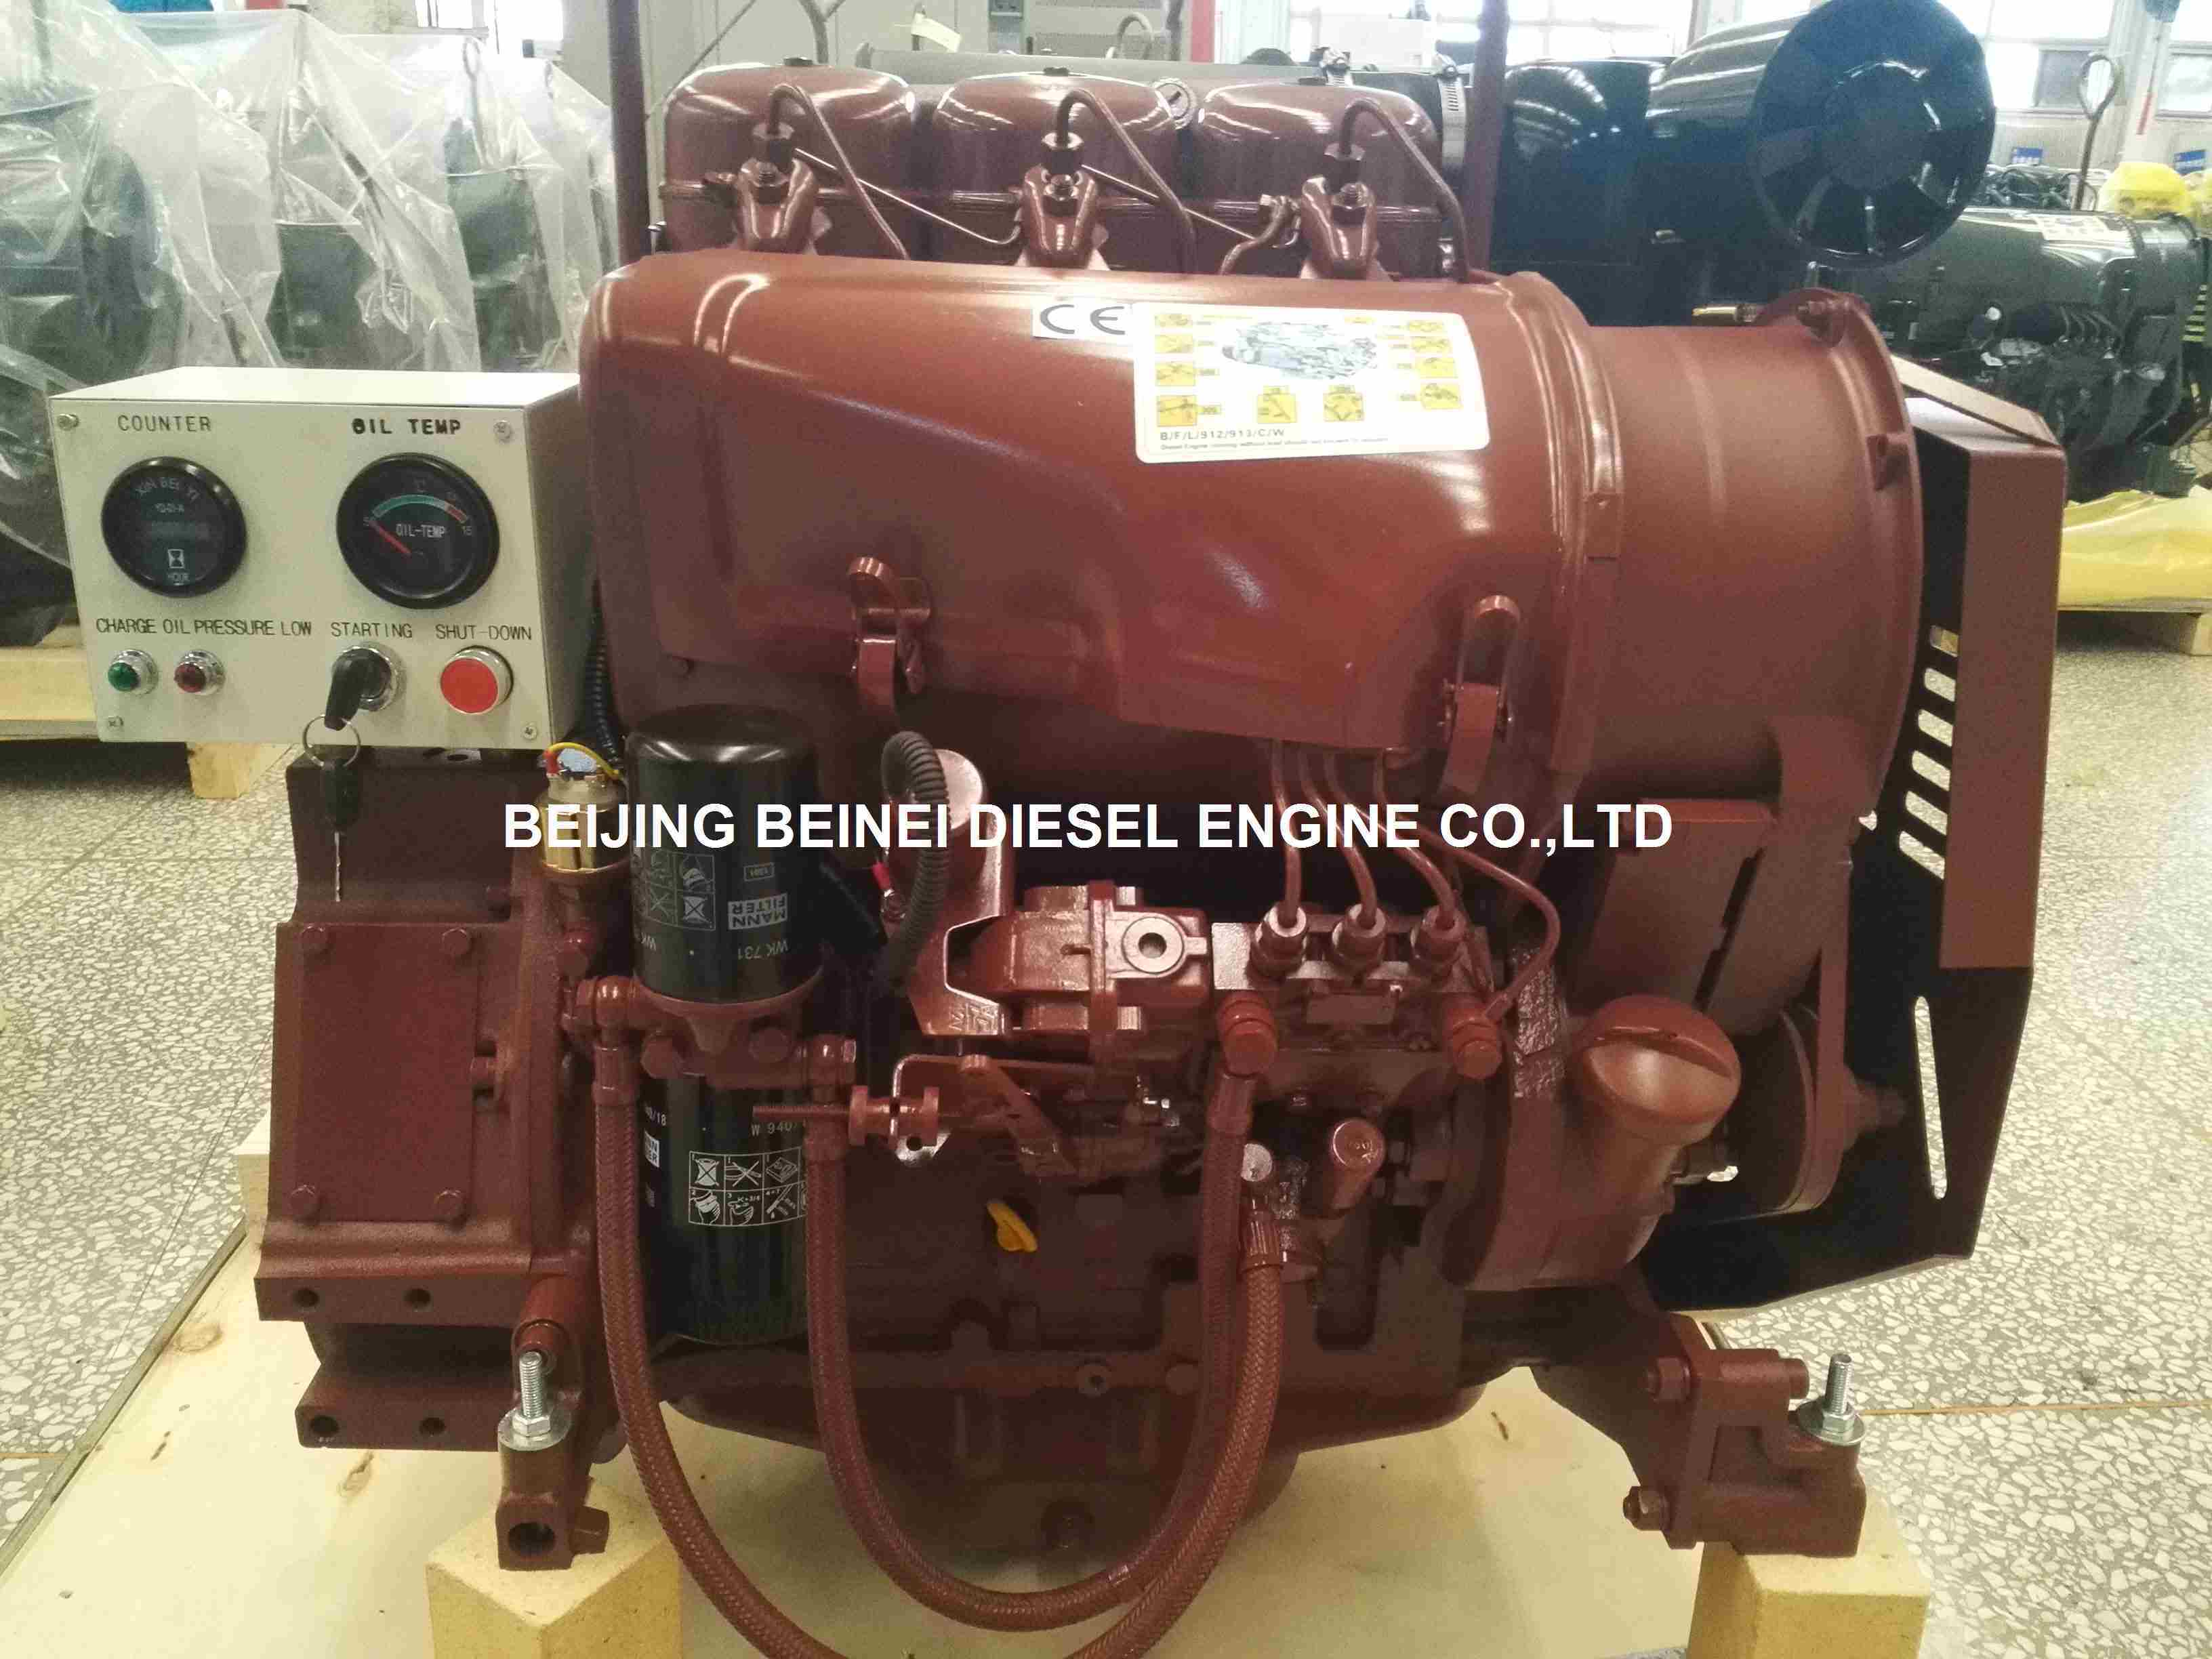 Diesel Engine Air Cooled Deutz F3l912 for Road Paver